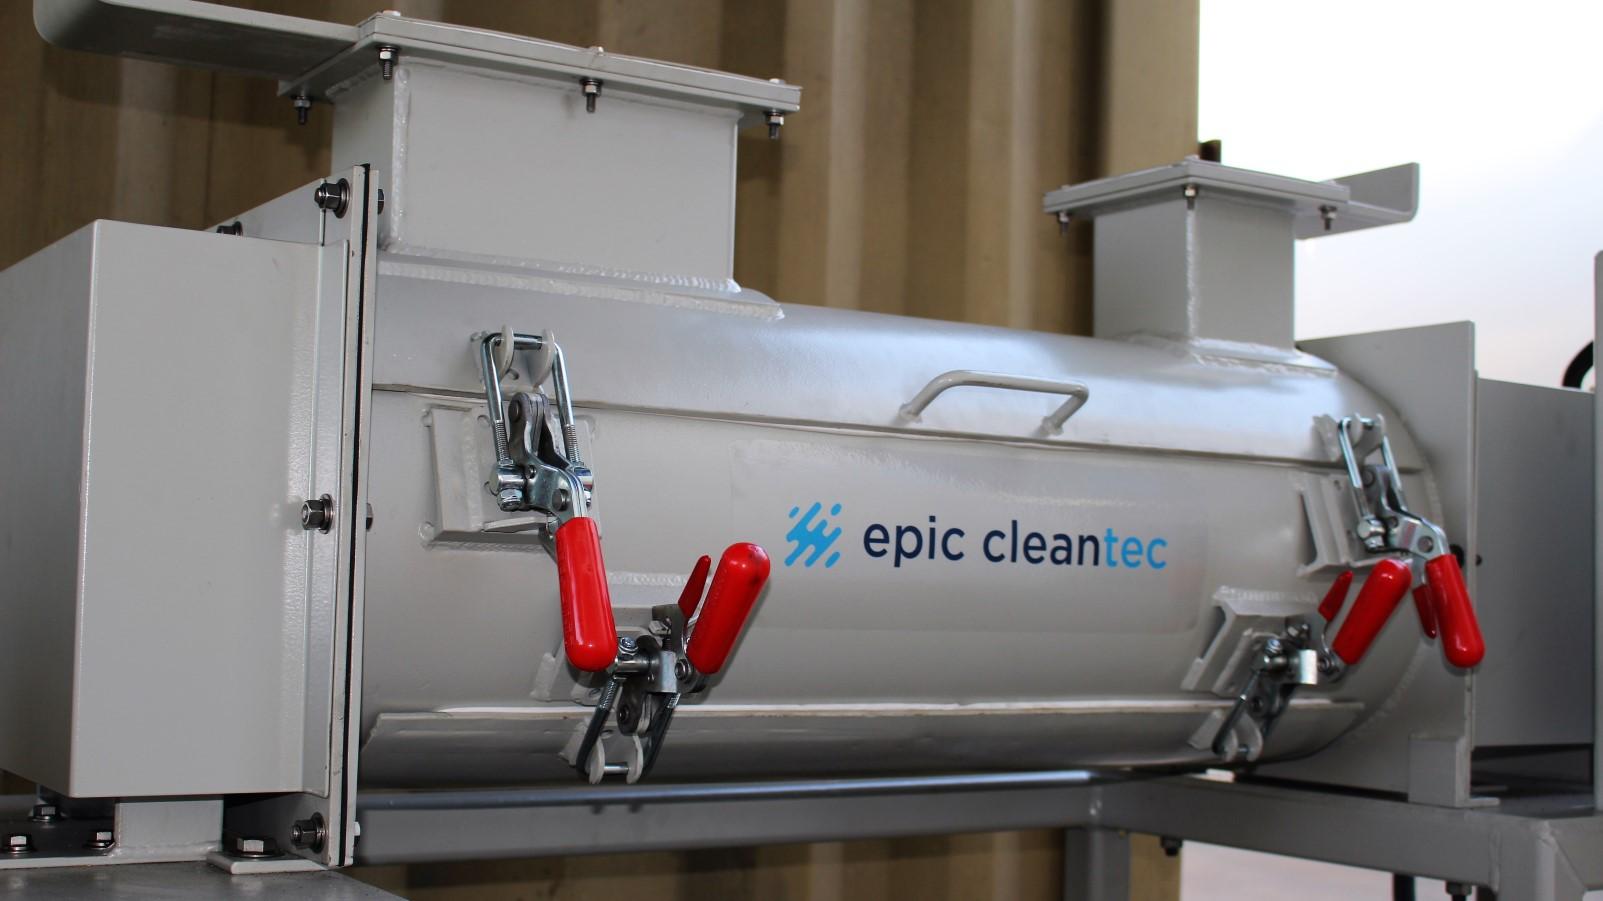 Epic CleanTec's prototype system. Photo: courtesy